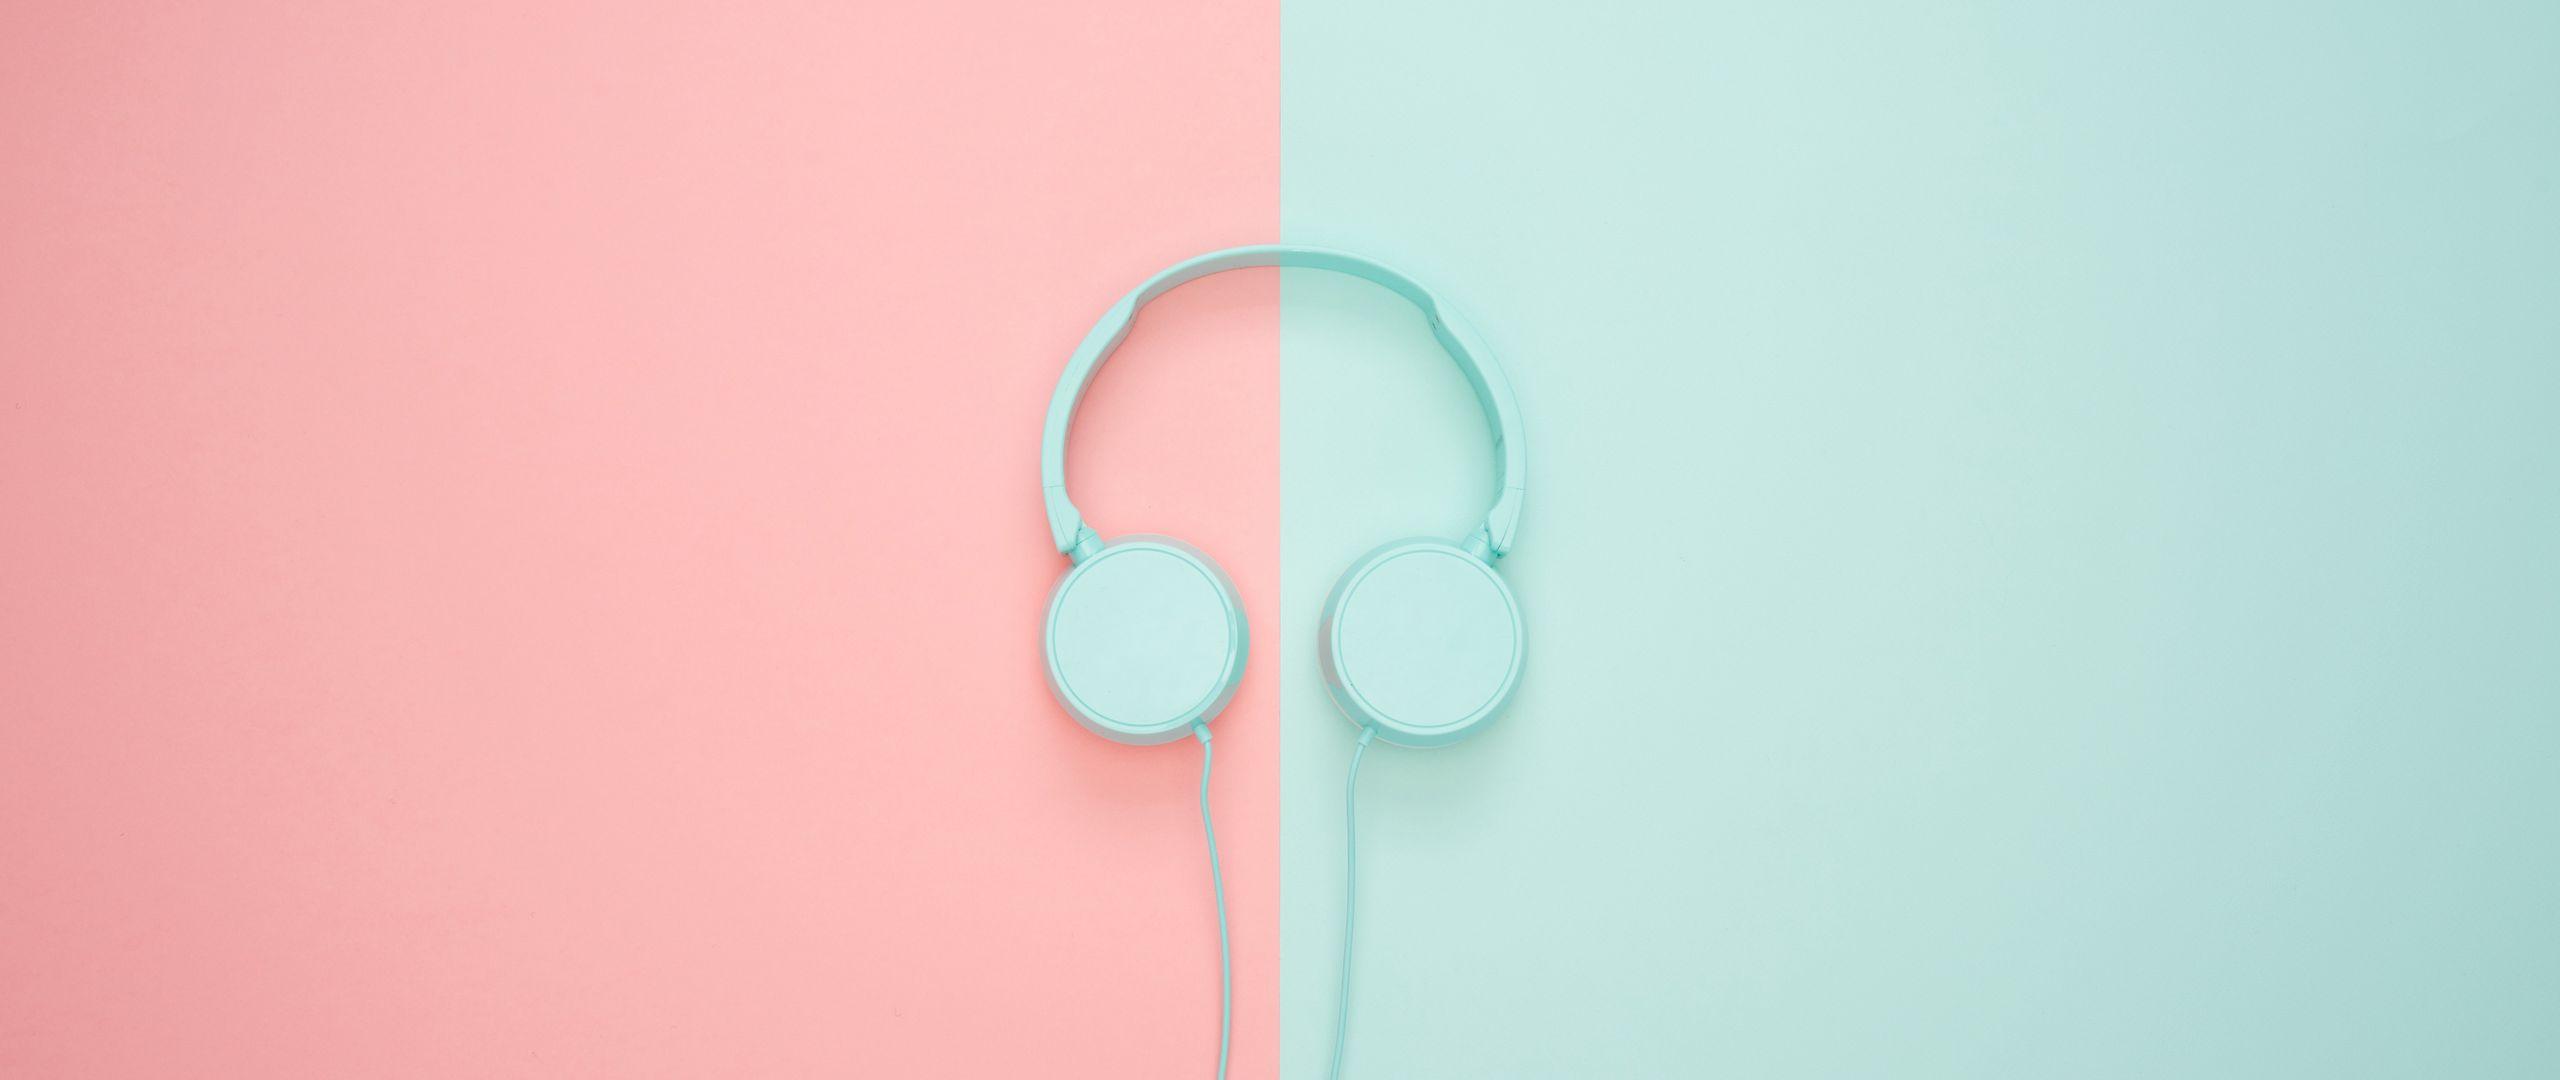 2560x1080 Wallpaper headphones, minimalism, pastel, pink